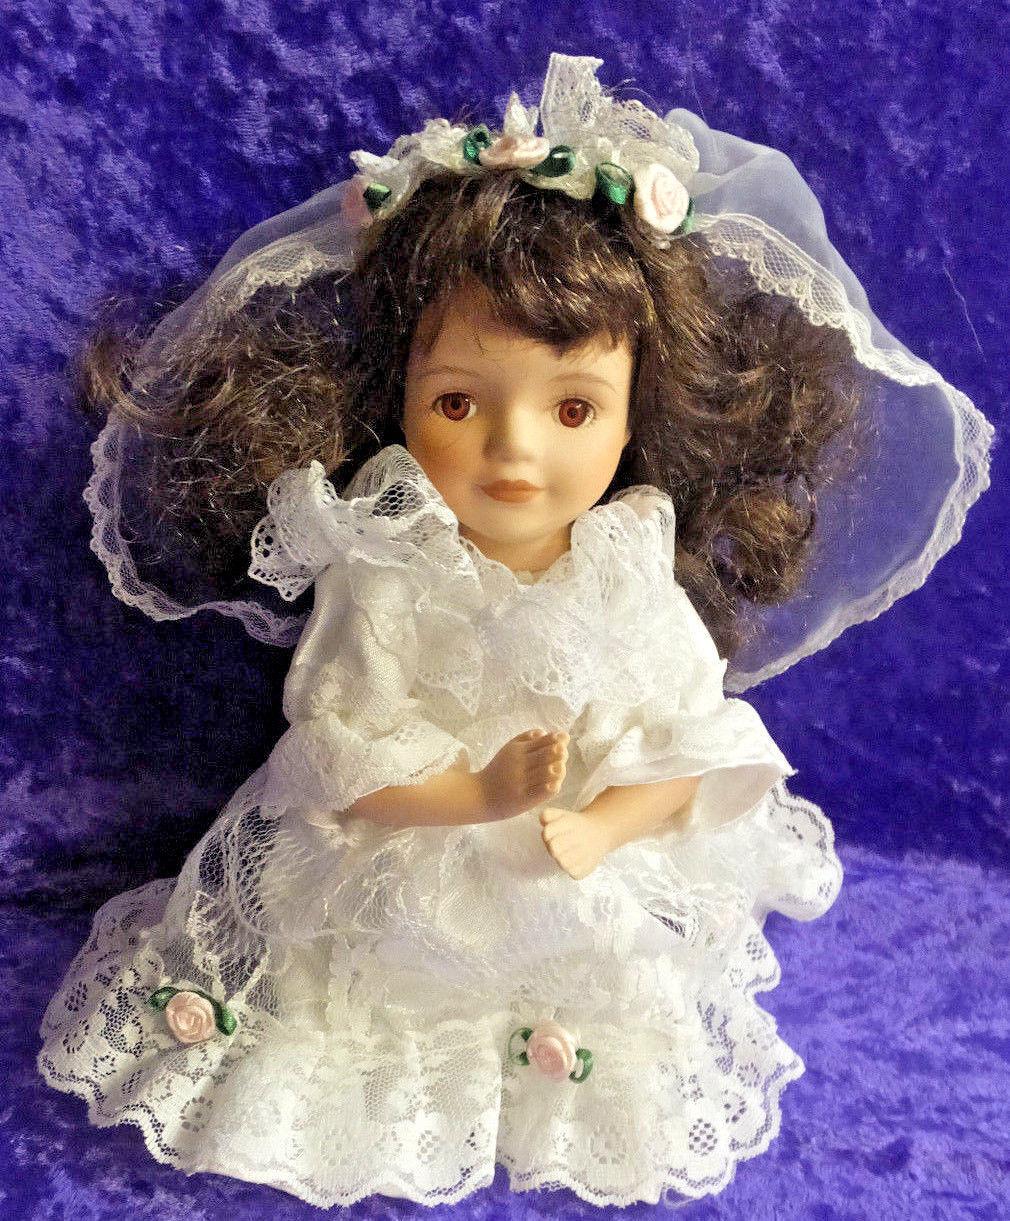 Handmade Porcelain Doll Litle Girl Kneeling Weiß Dress with Weiß Lace braun Ha